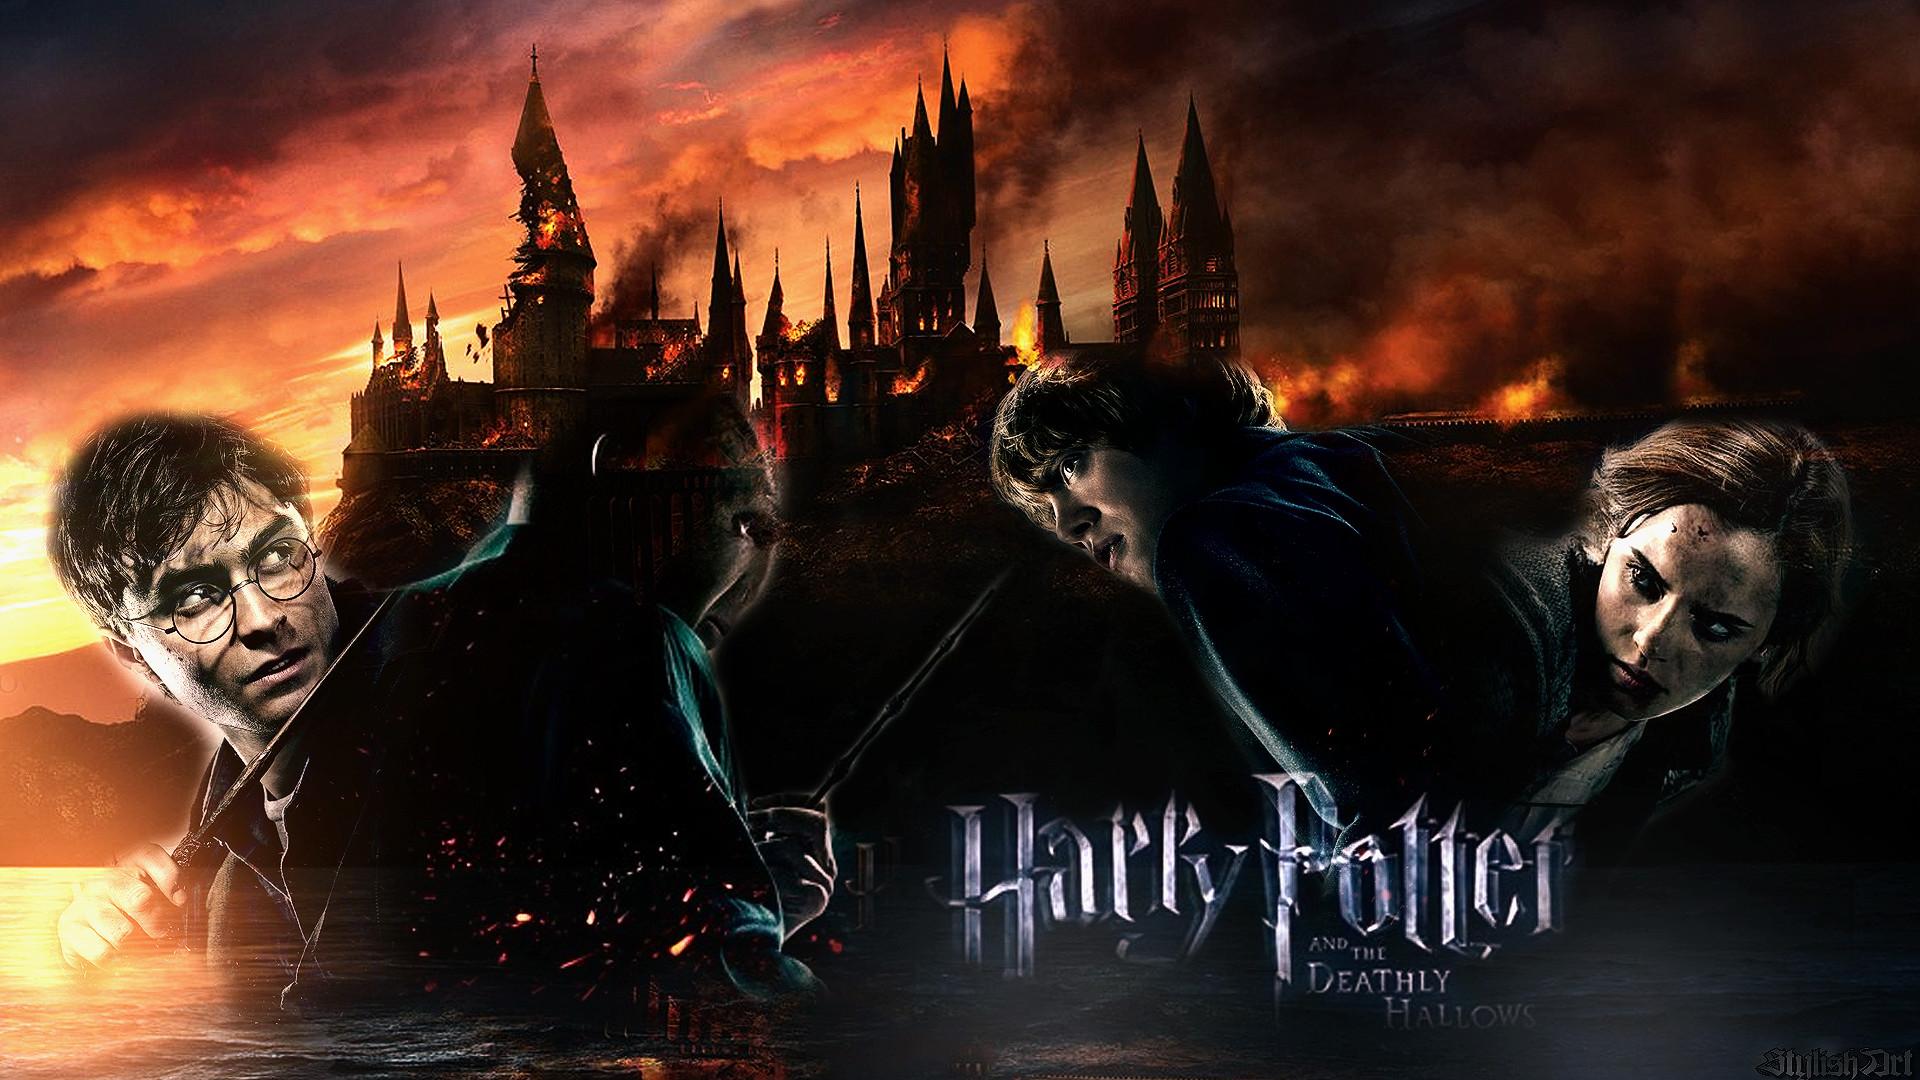 Cool Wallpaper Harry Potter 1080p - 637302  Graphic_423487.jpg